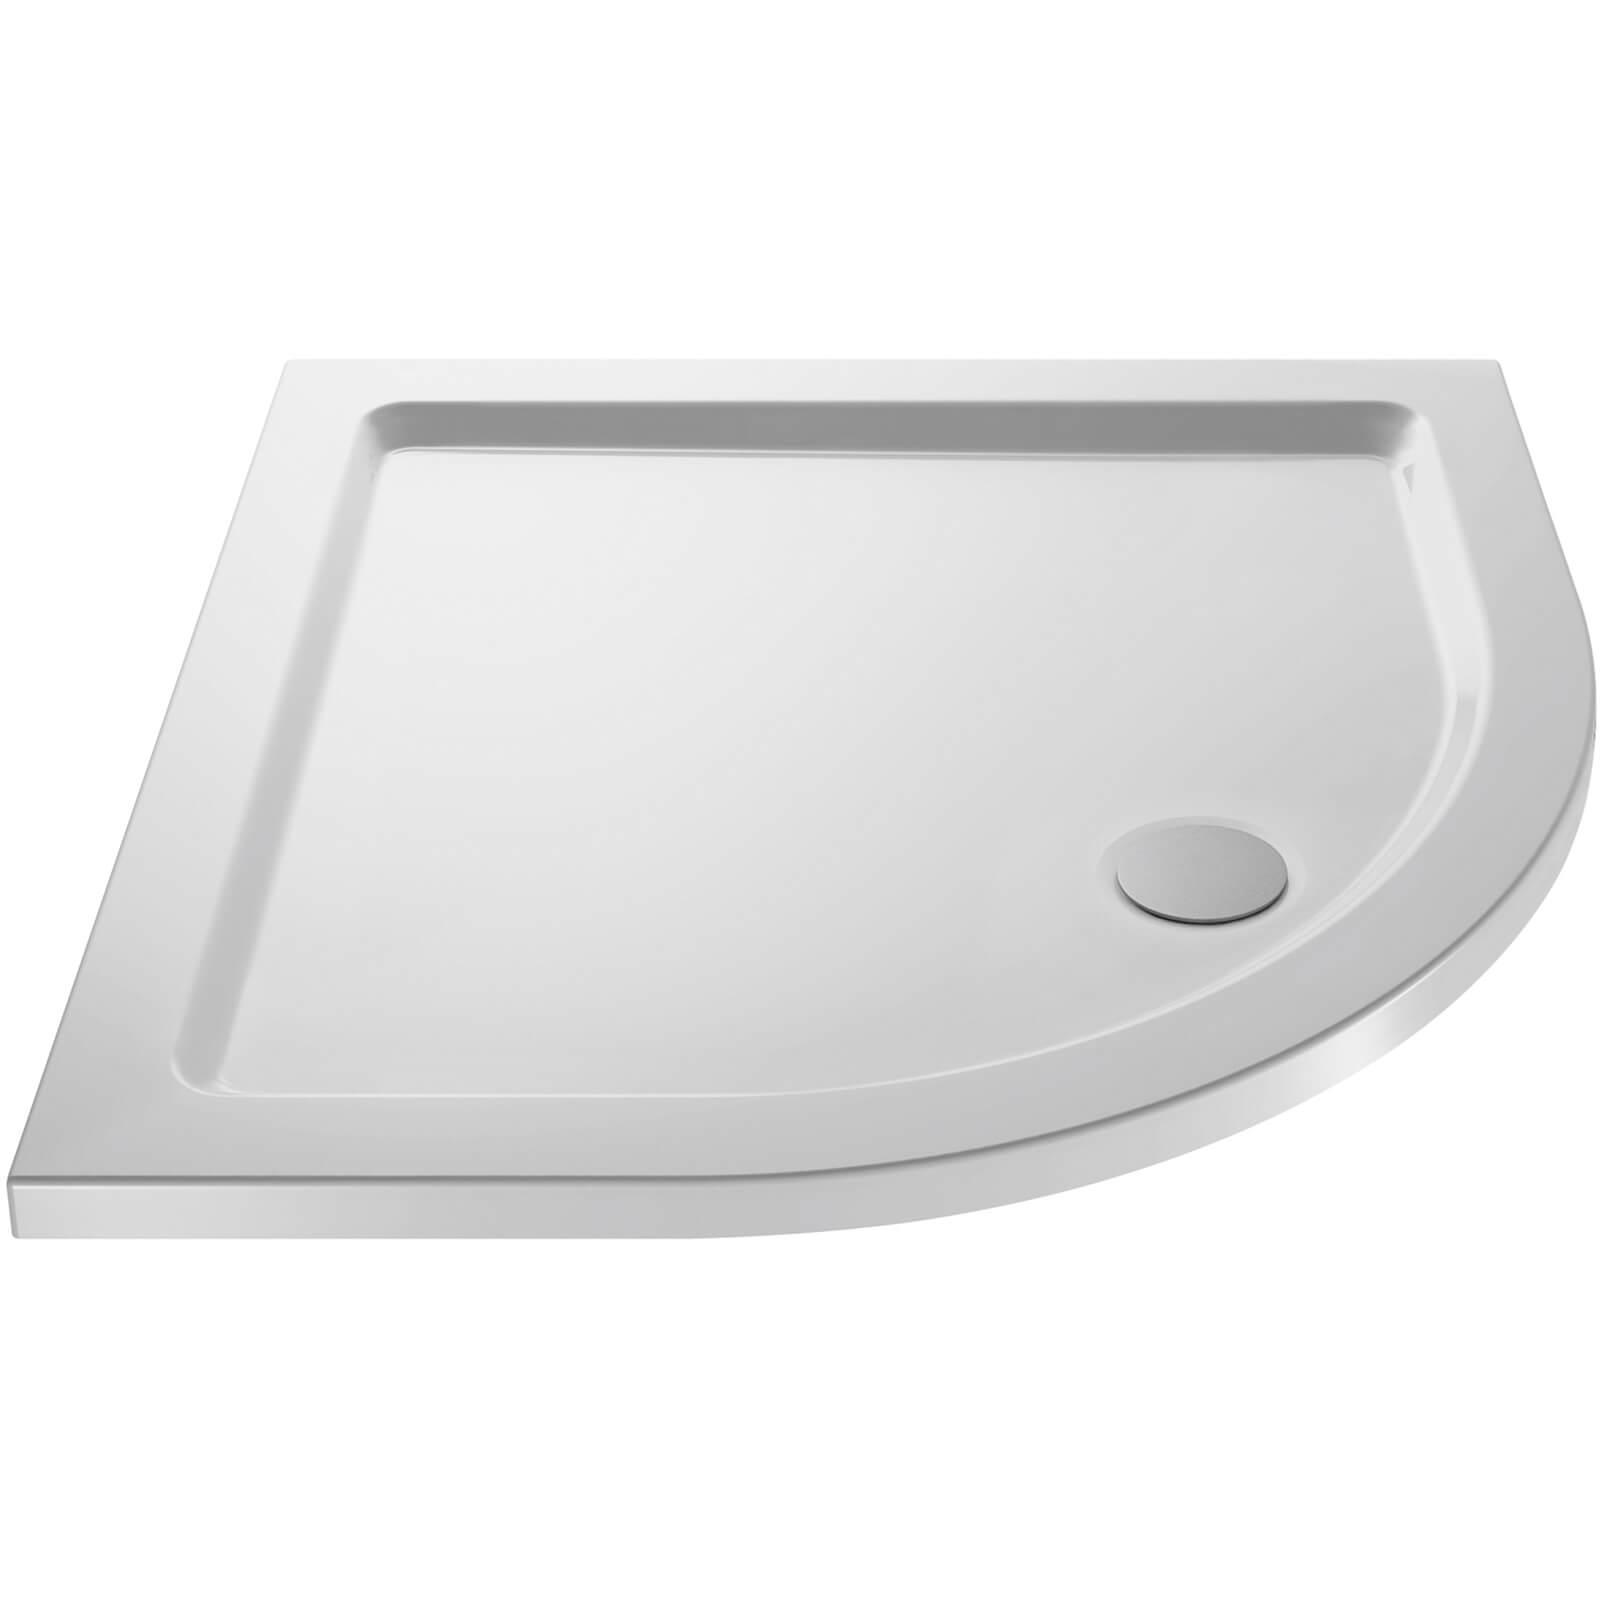 Balterley Quadrant Shower Tray - 760 x 760mm